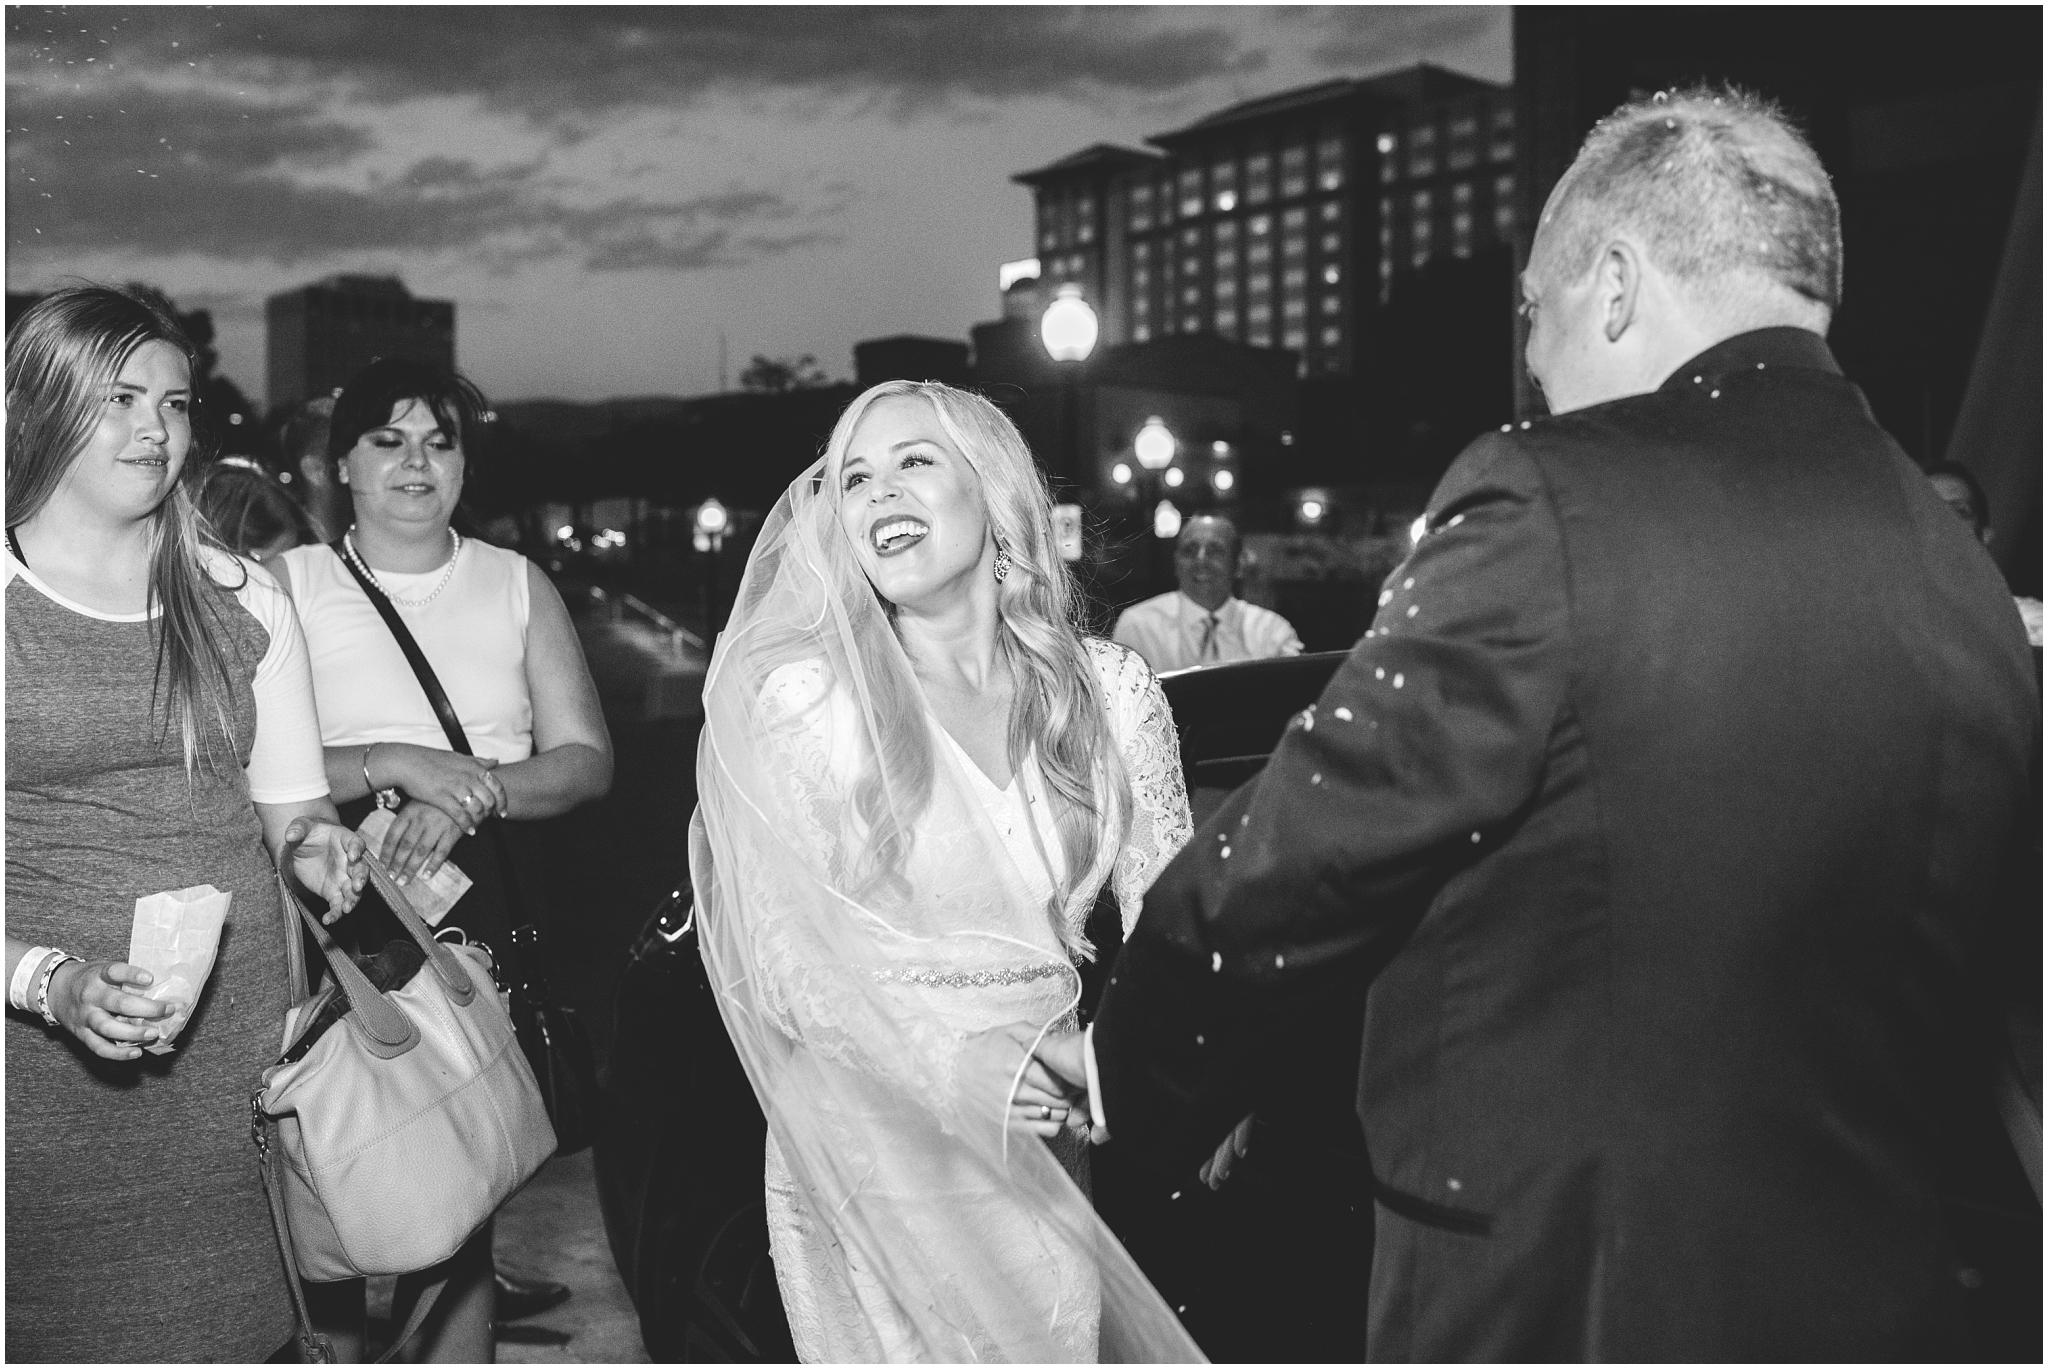 CherylandTyler-660_Lizzie-B-Imagery-Utah-Wedding-Photographer-Salt-Lake-City-Temple-Wells-Fargo-Building-Reception.jpg